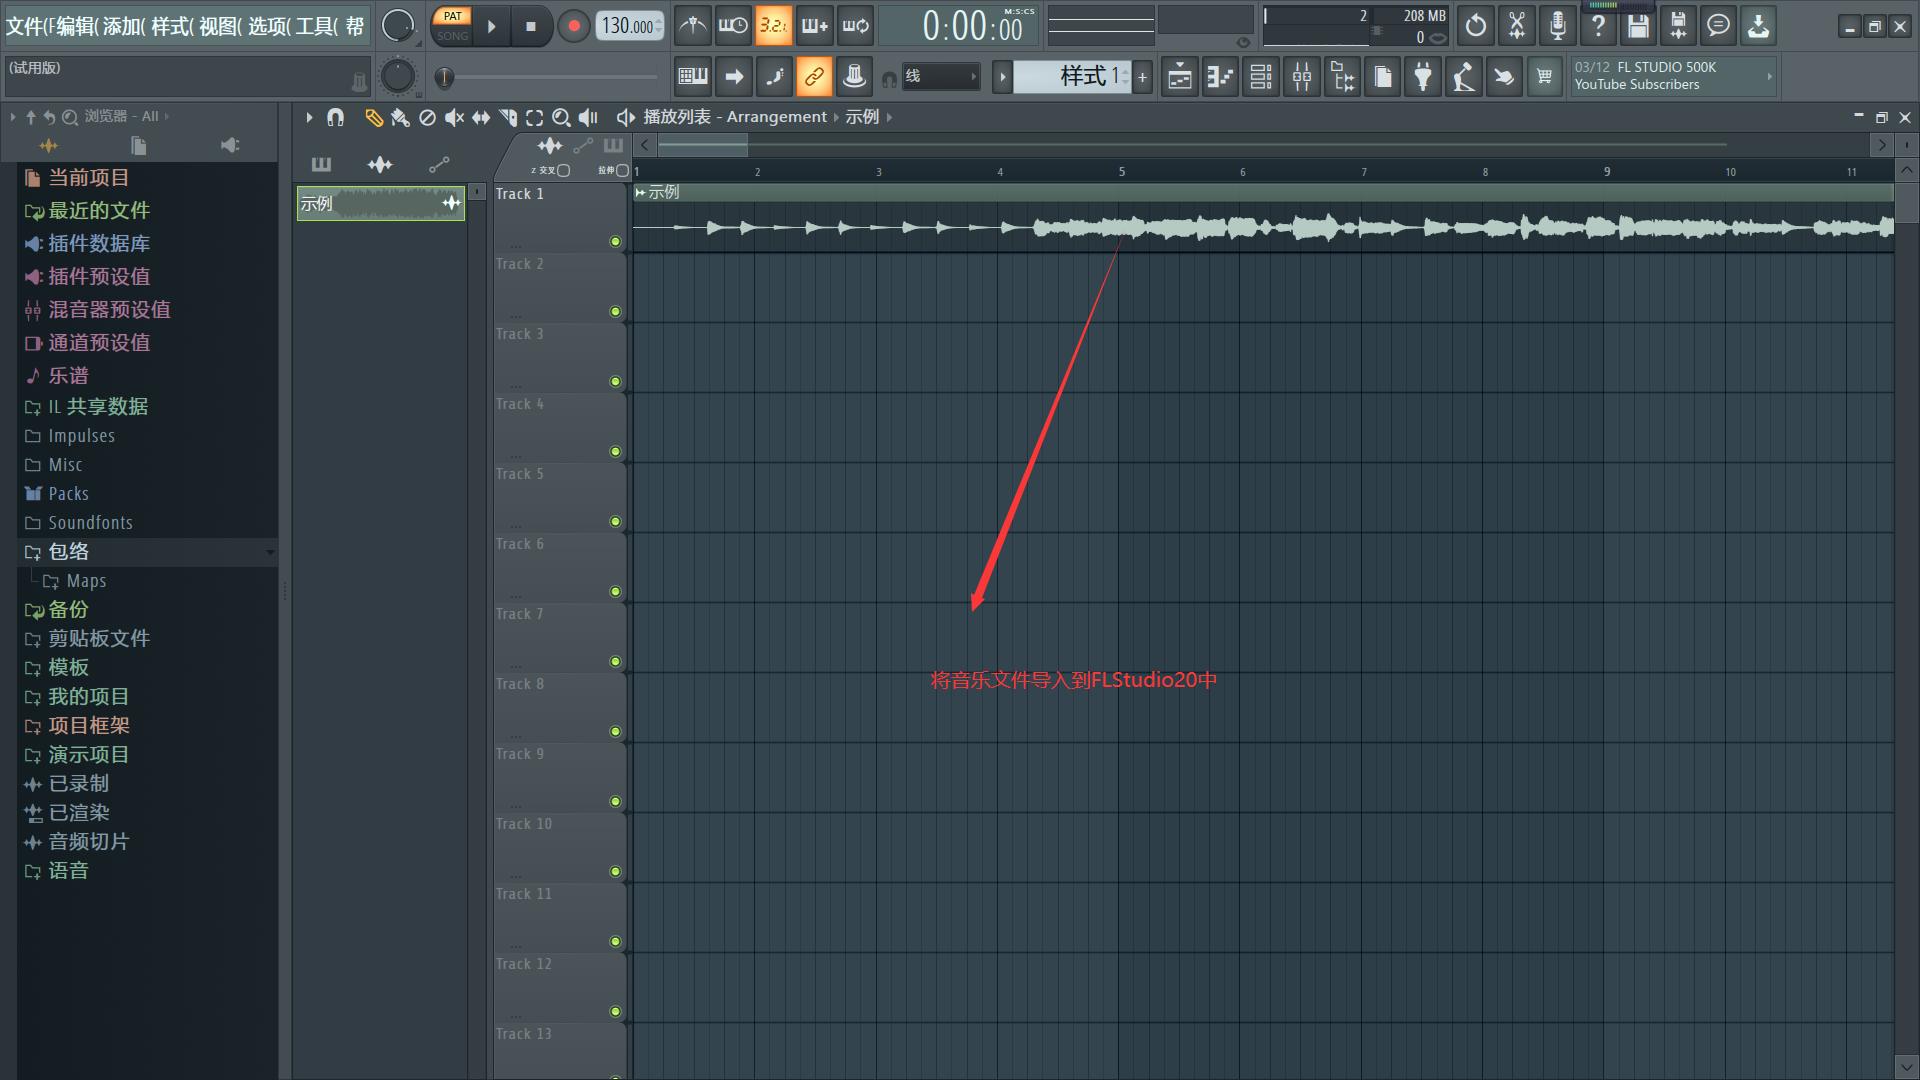 图1.fl studio主界面